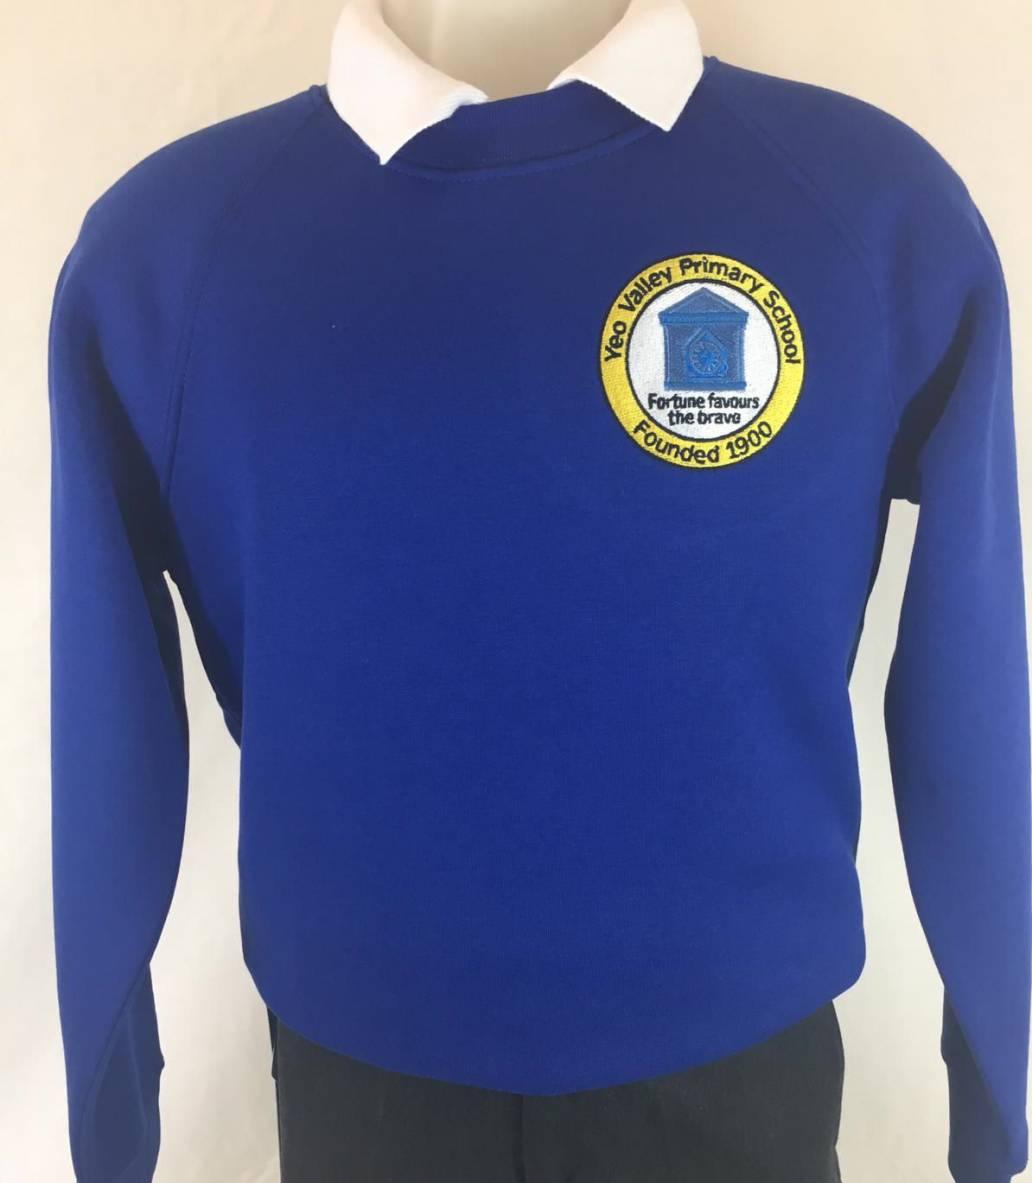 Yeo Valley Primary School Sweatshirt